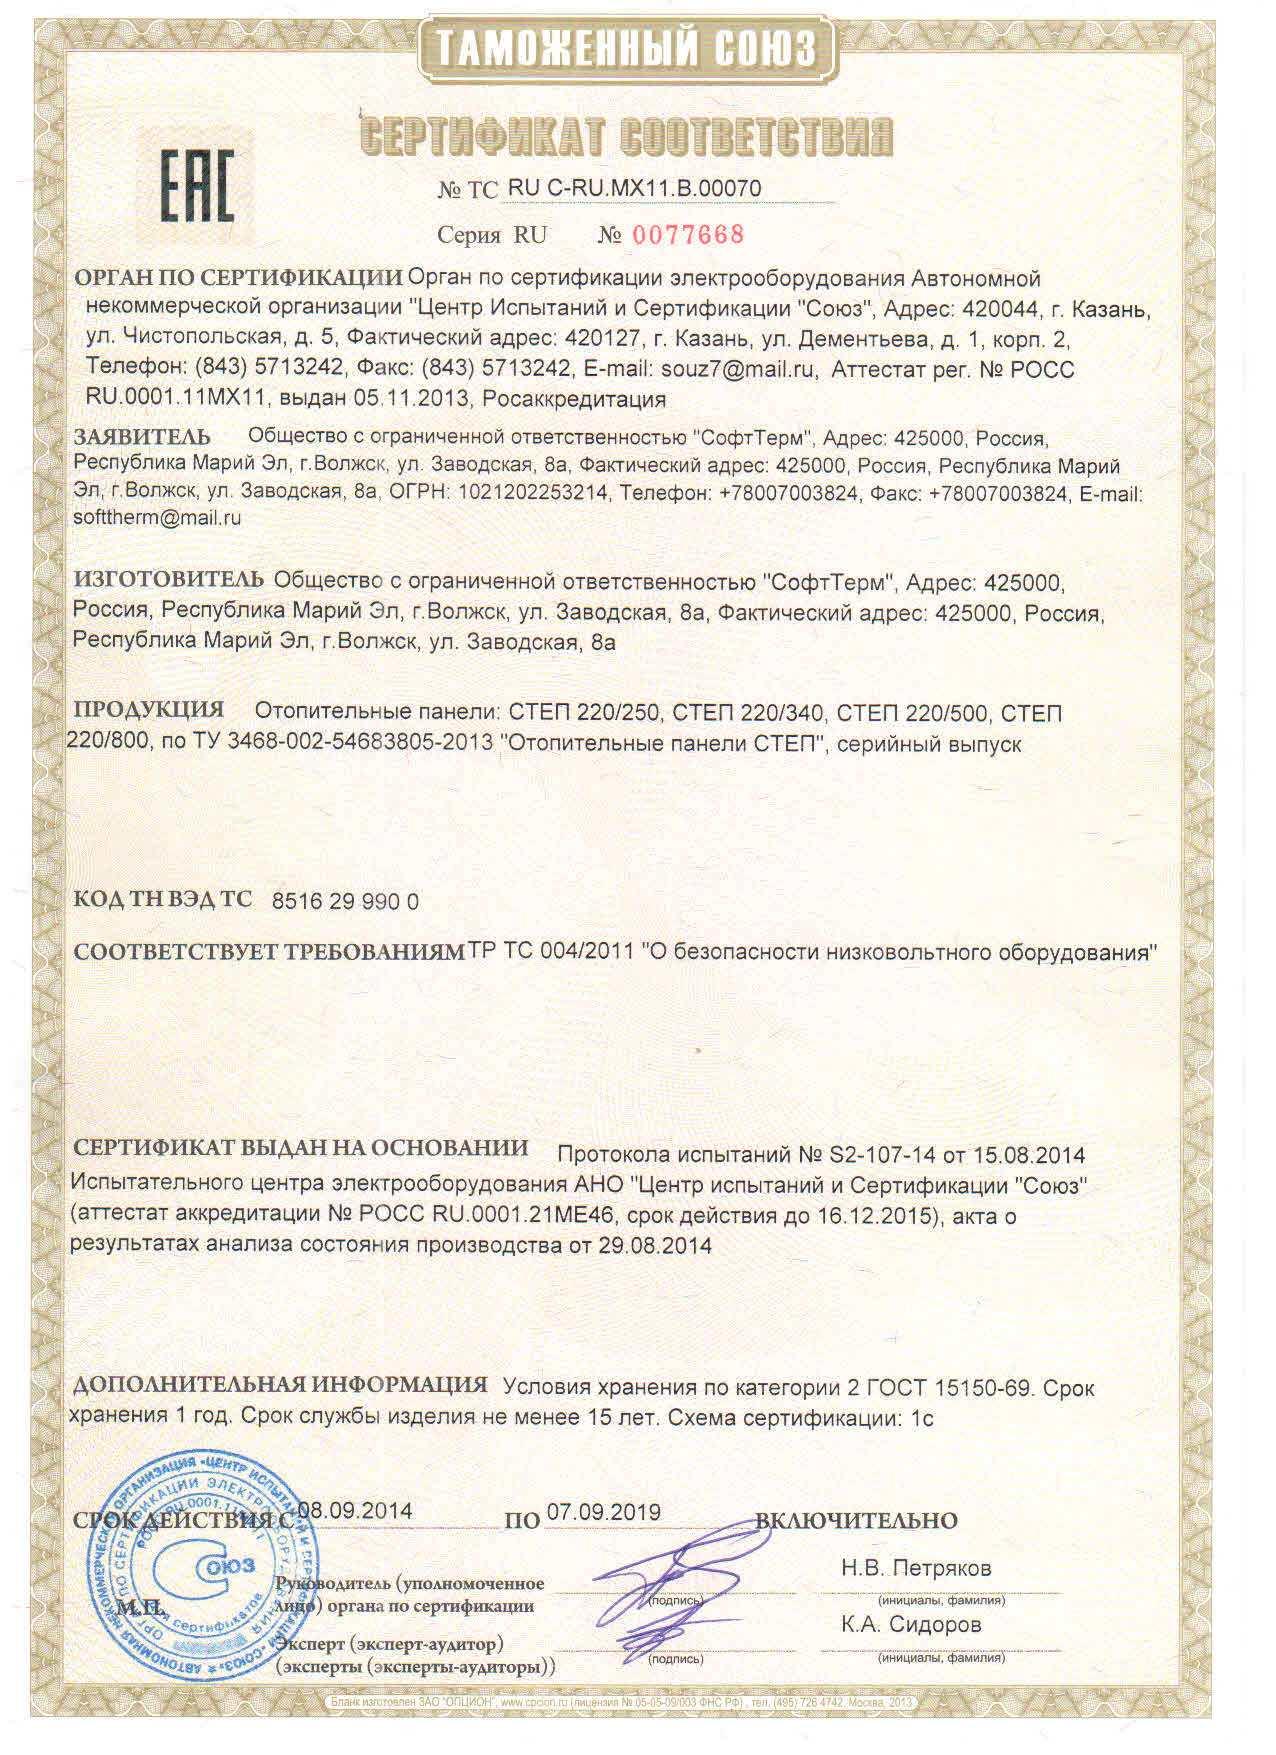 Сертификат соответствия на панели СТЕП